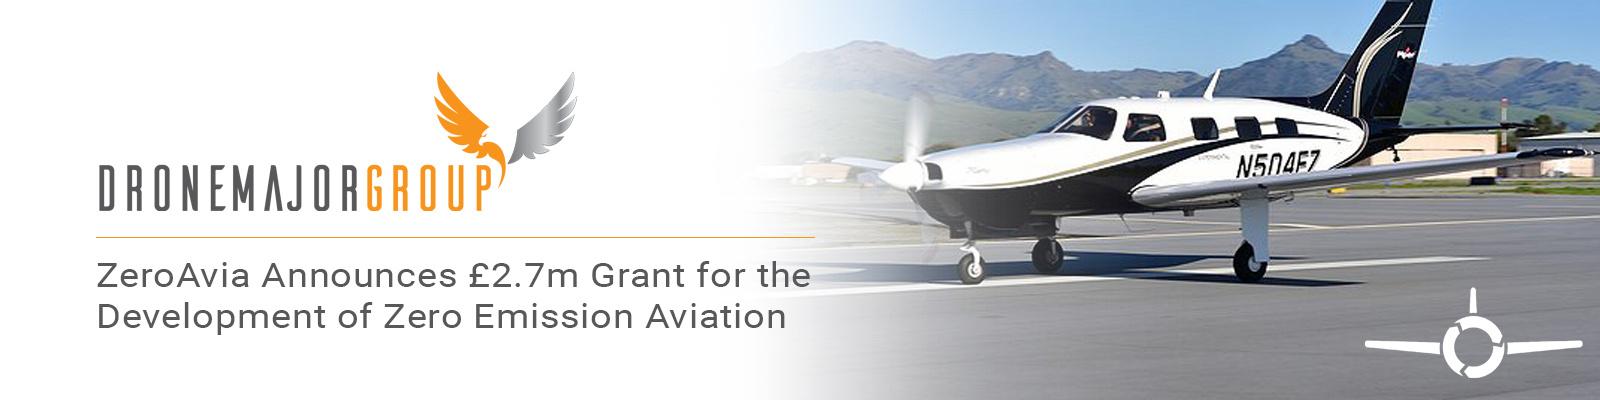 ZeroAvia Announces £2.7m UK Government Grant for the Development of Zero Emission Aviation